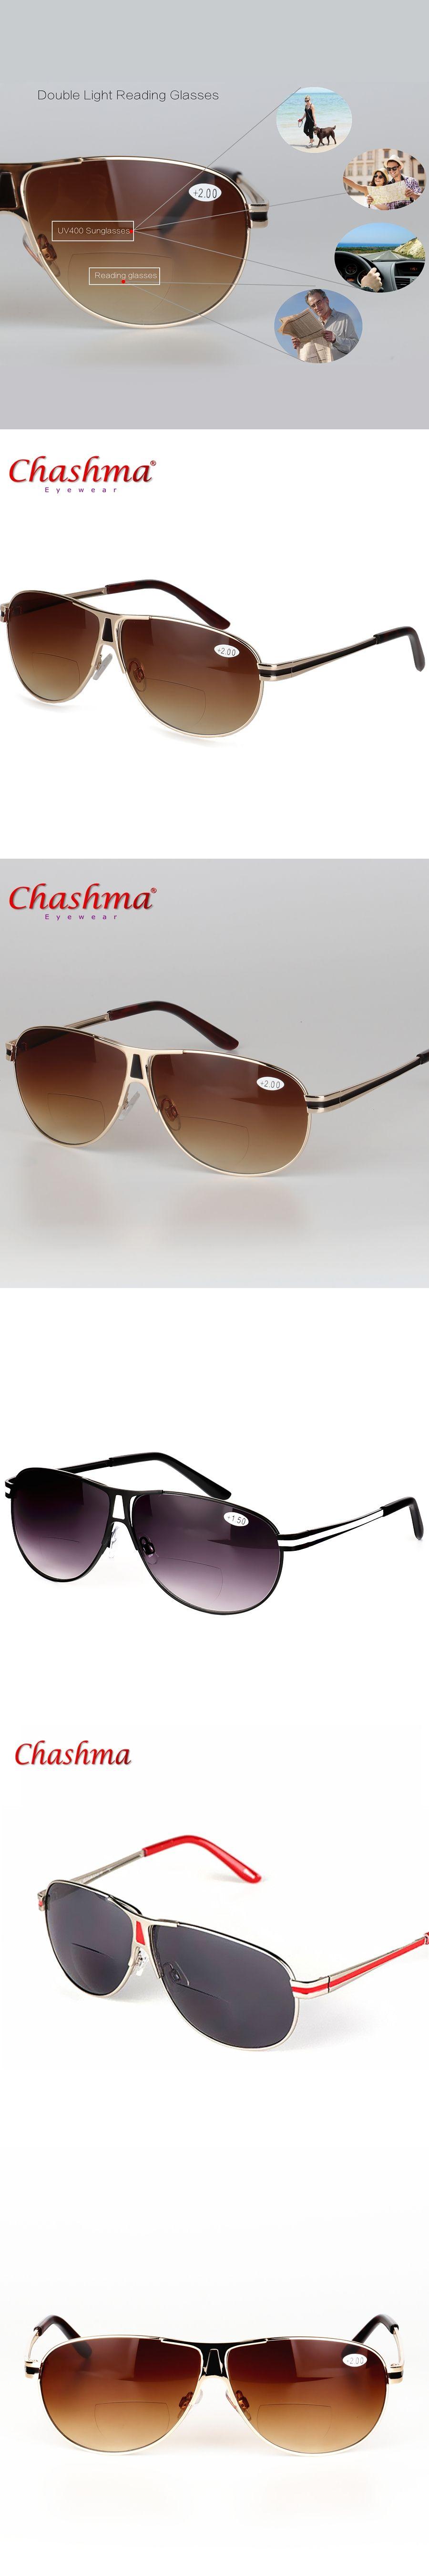 6aa341585c Bifocal Reading Glasses Unisex Diopter Glasses Male Polarized Sunglasses  Presbyopic Eyeglasses +1.0+1.5+